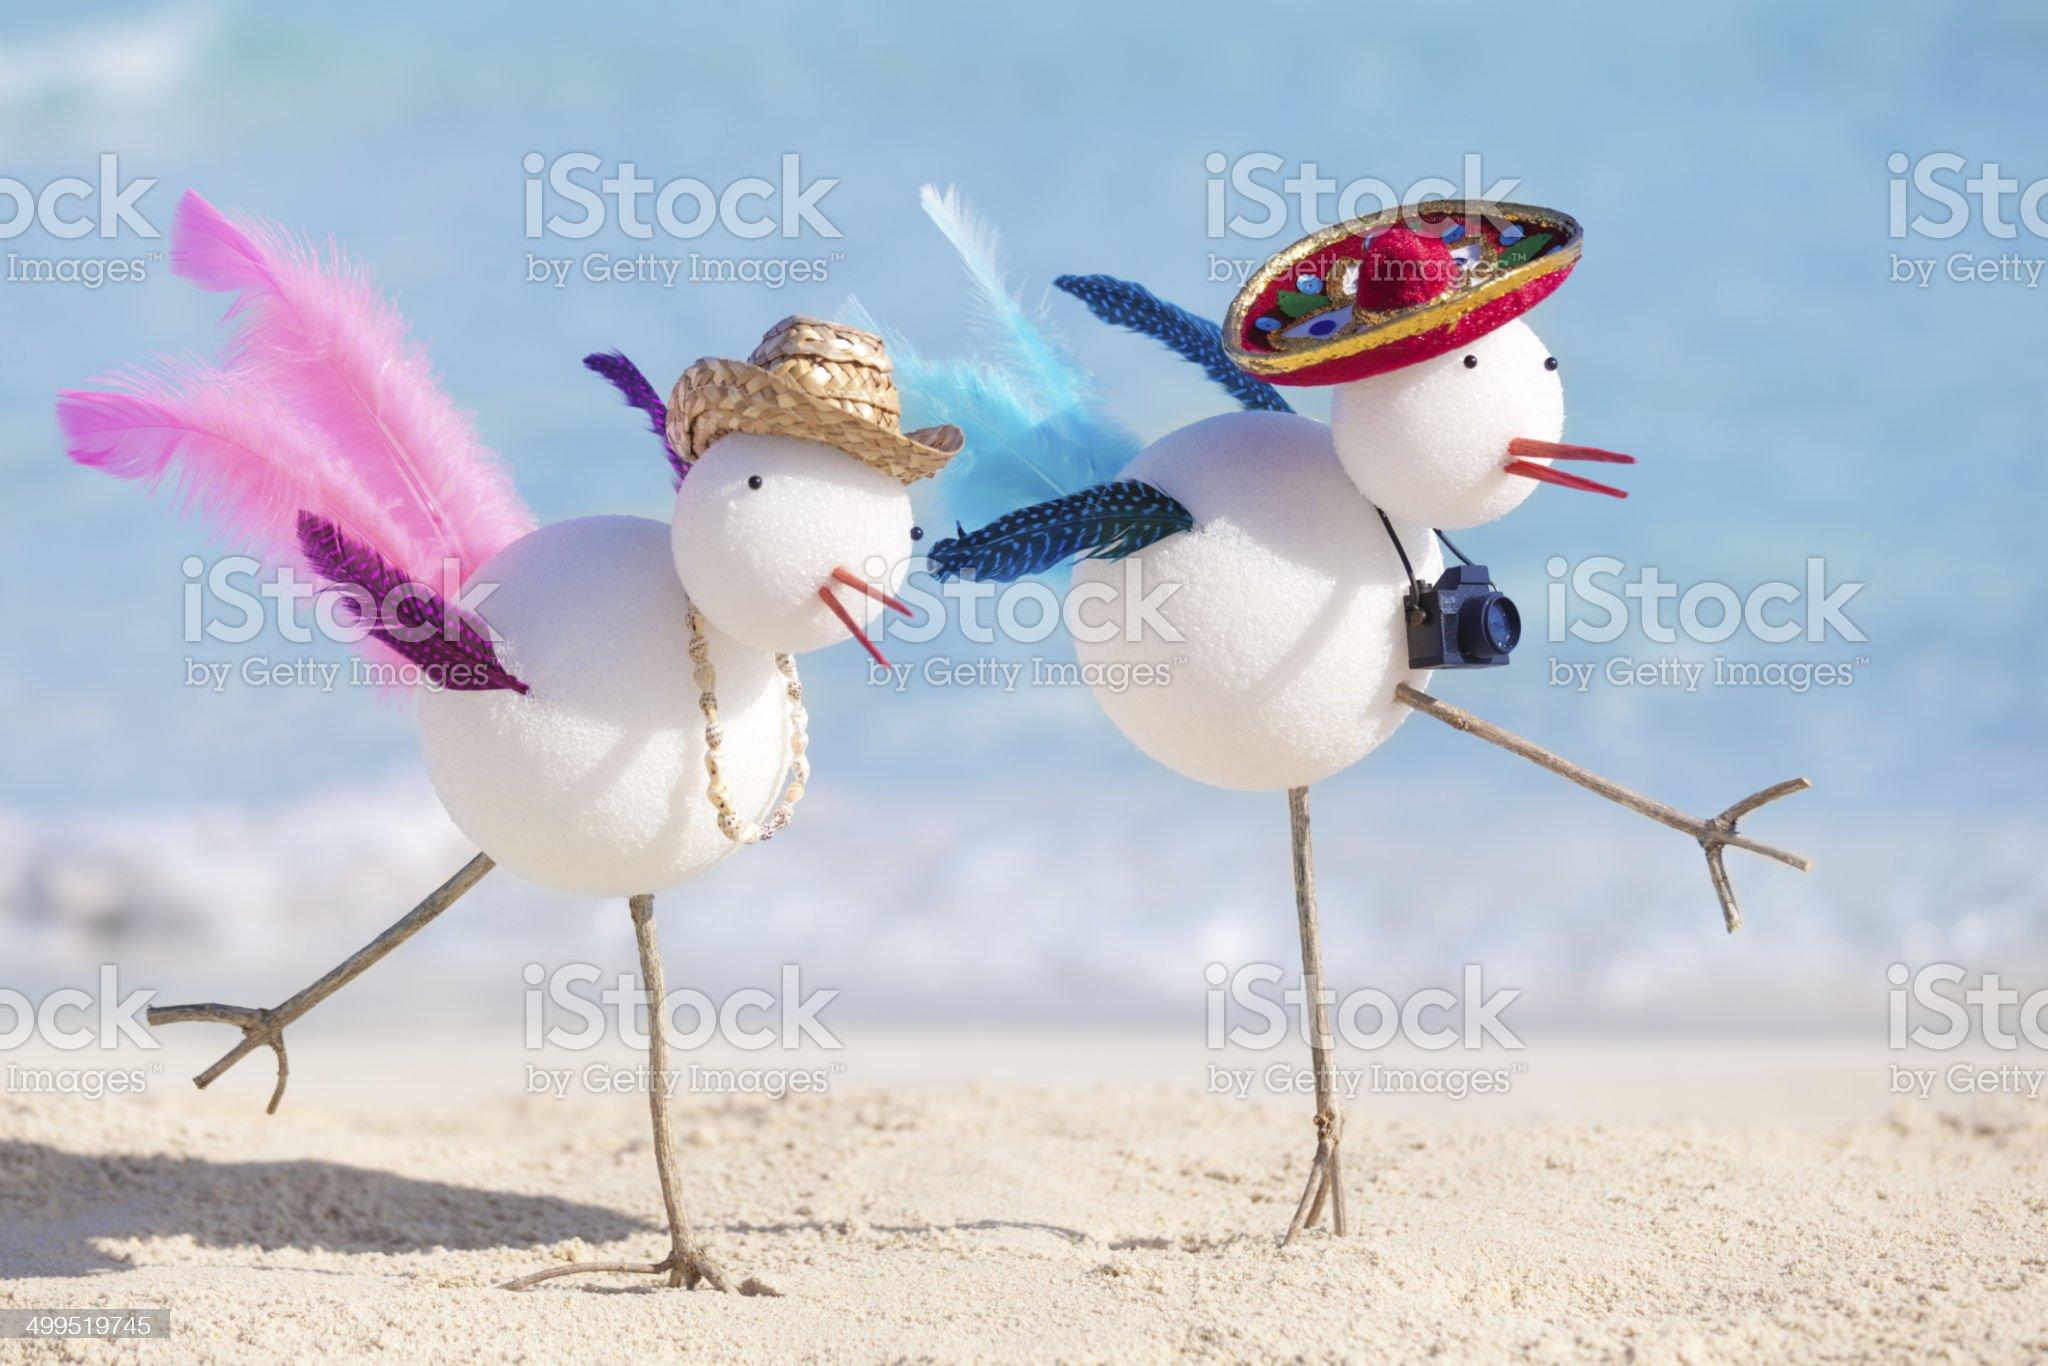 Snowbird Couple Enjoying Tropical Beach in Winter Vacation royalty-free stock photo